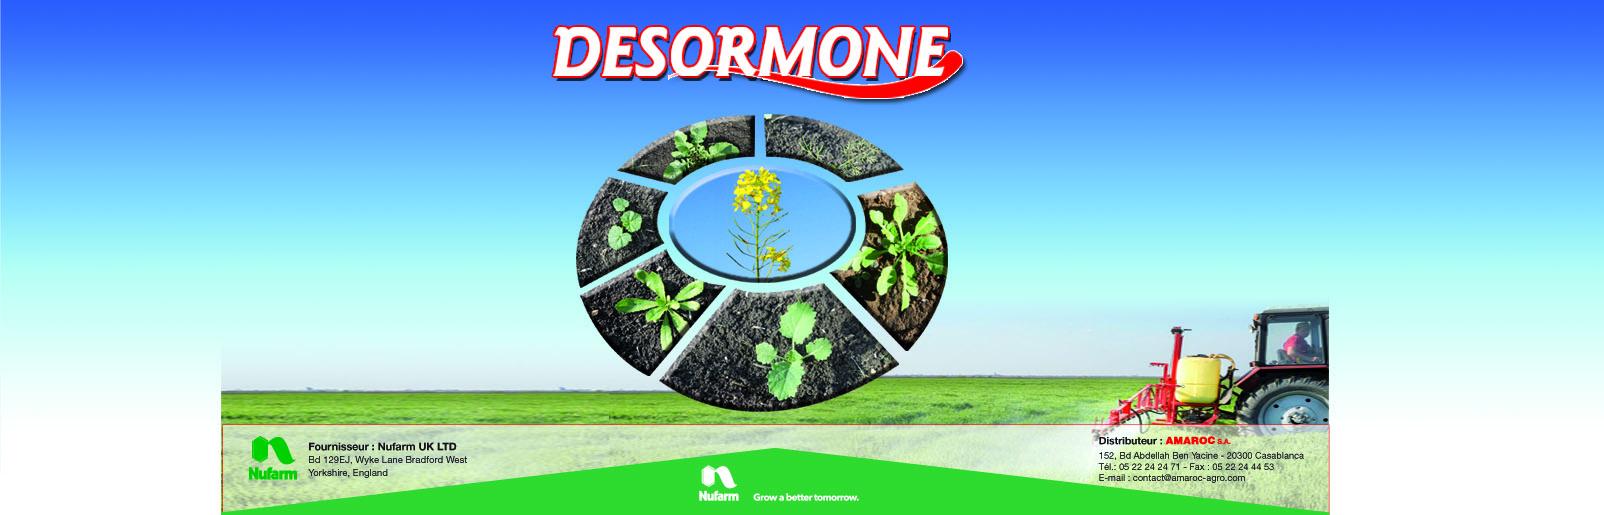 Insertion Desormone